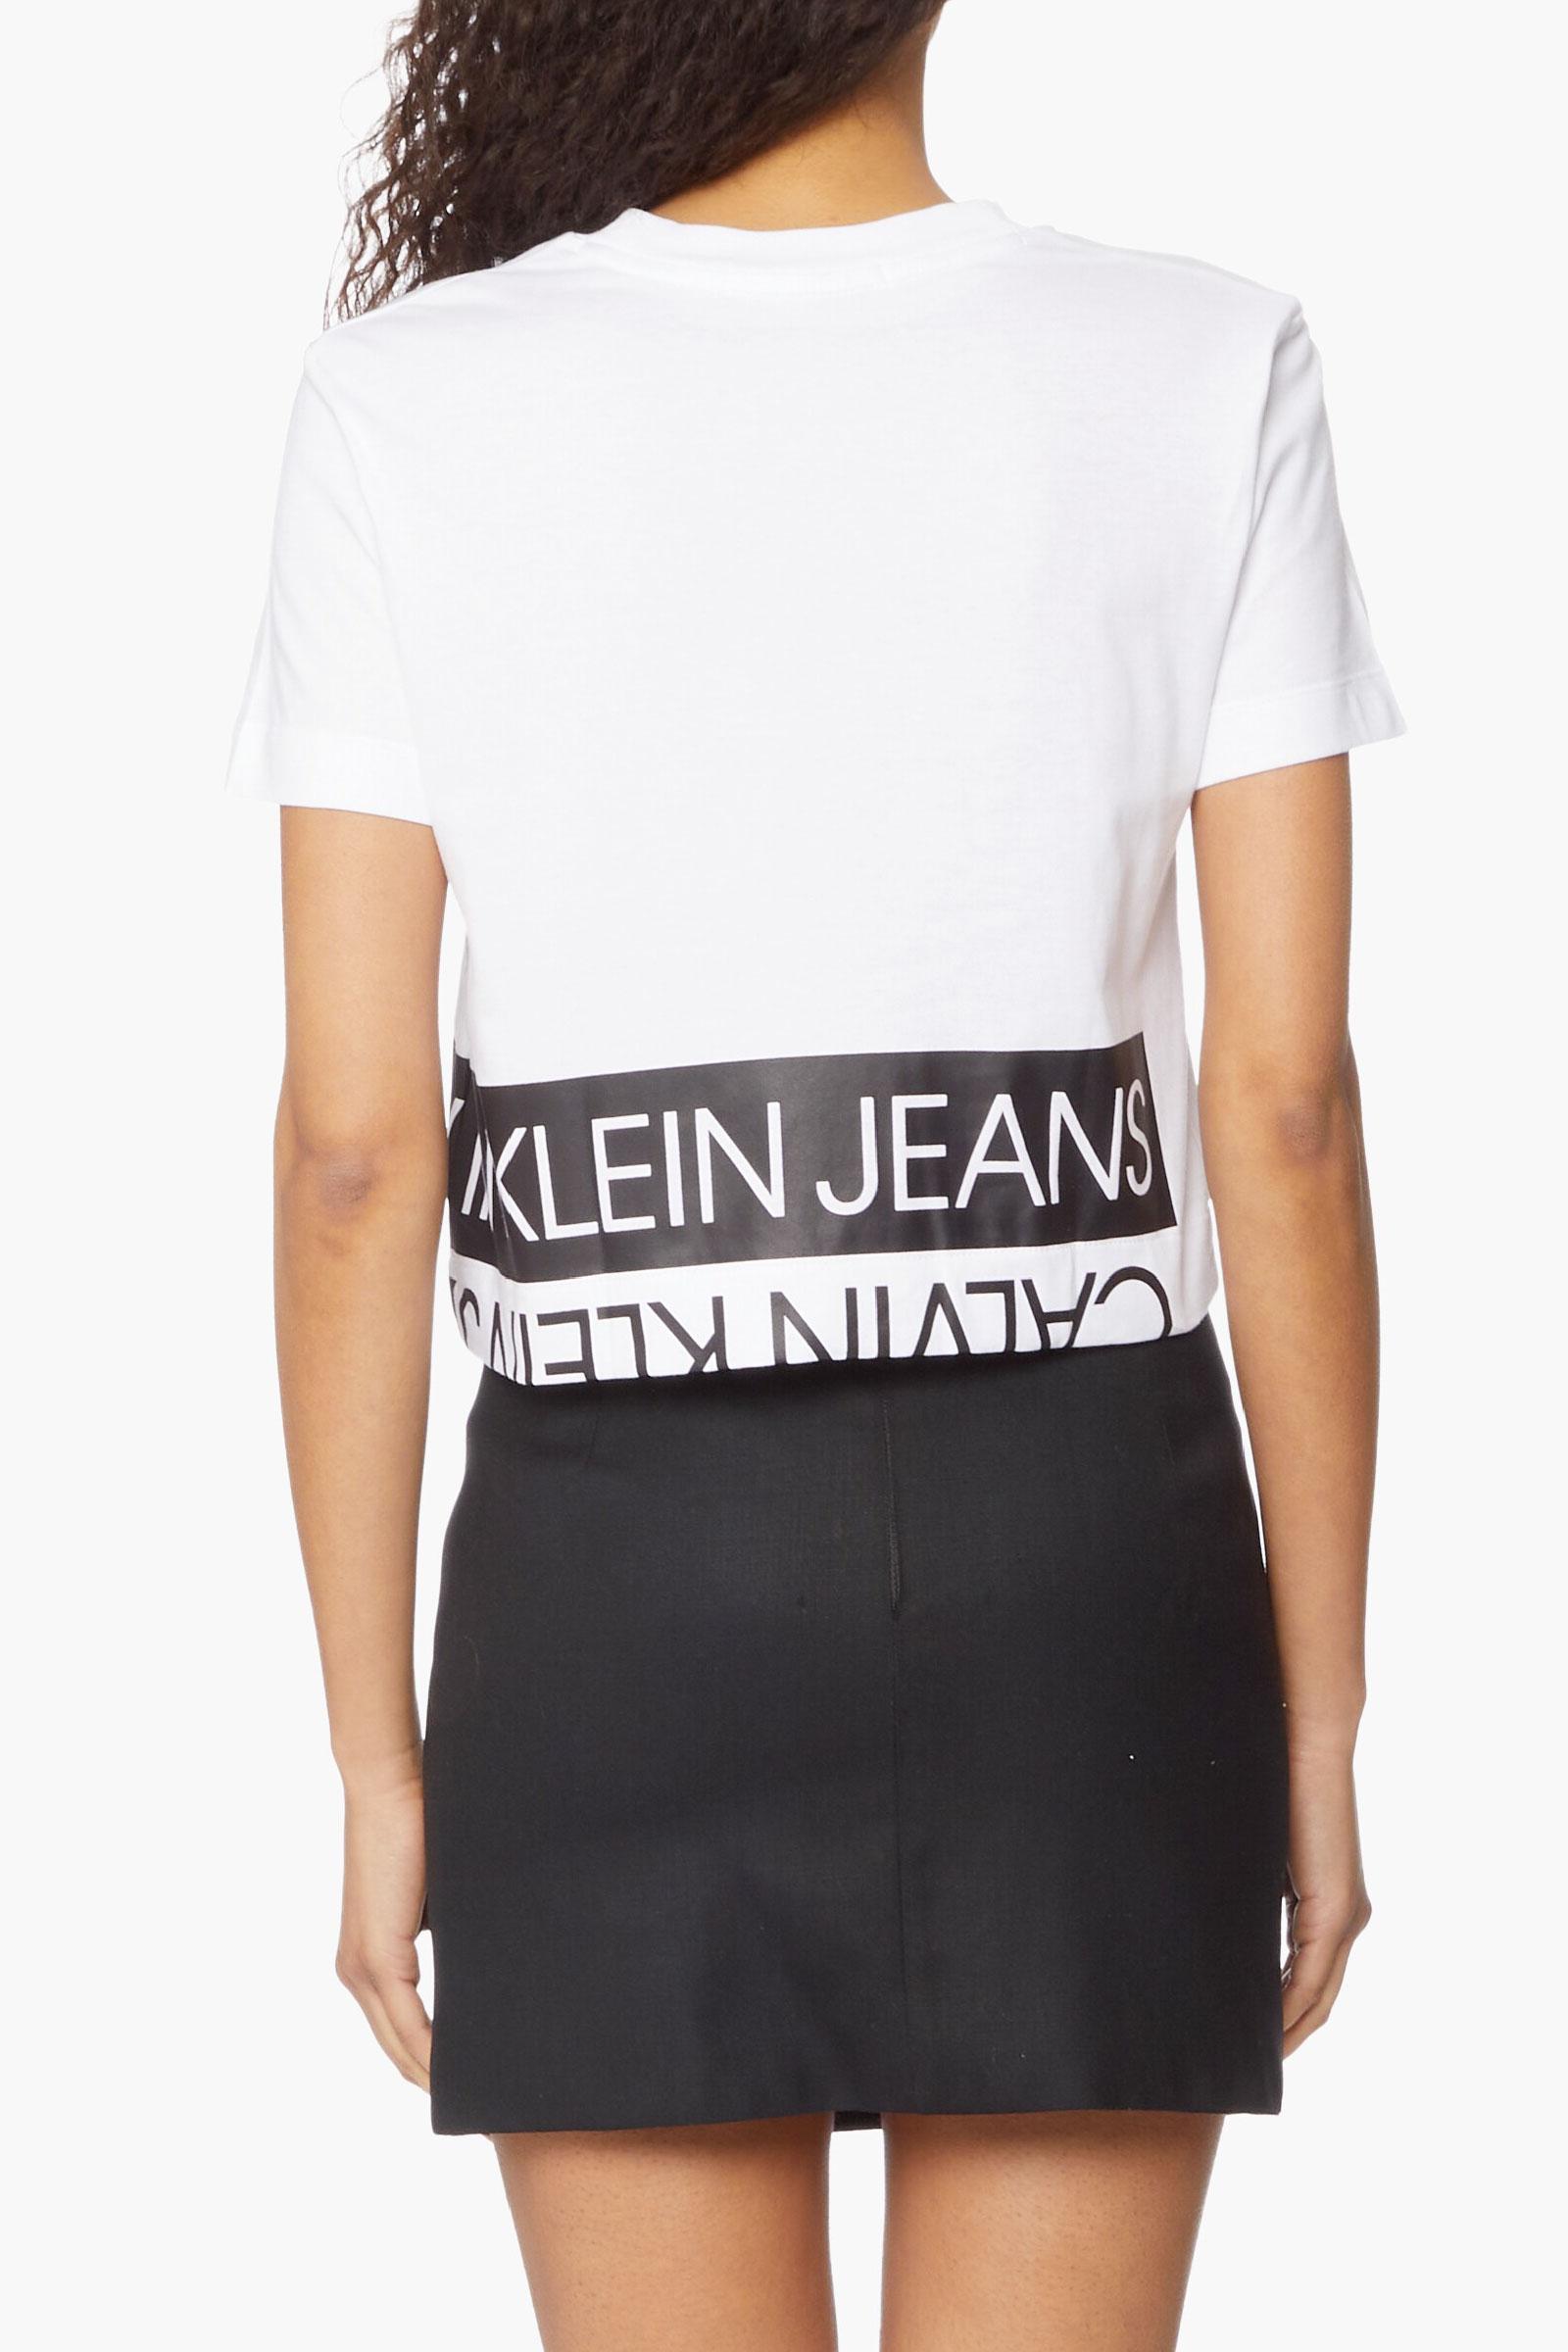 CALVIN KLEIN JEANS Women's T-Shirt CALVIN KLEIN JEANS   T-Shirt   J20J215324YAF